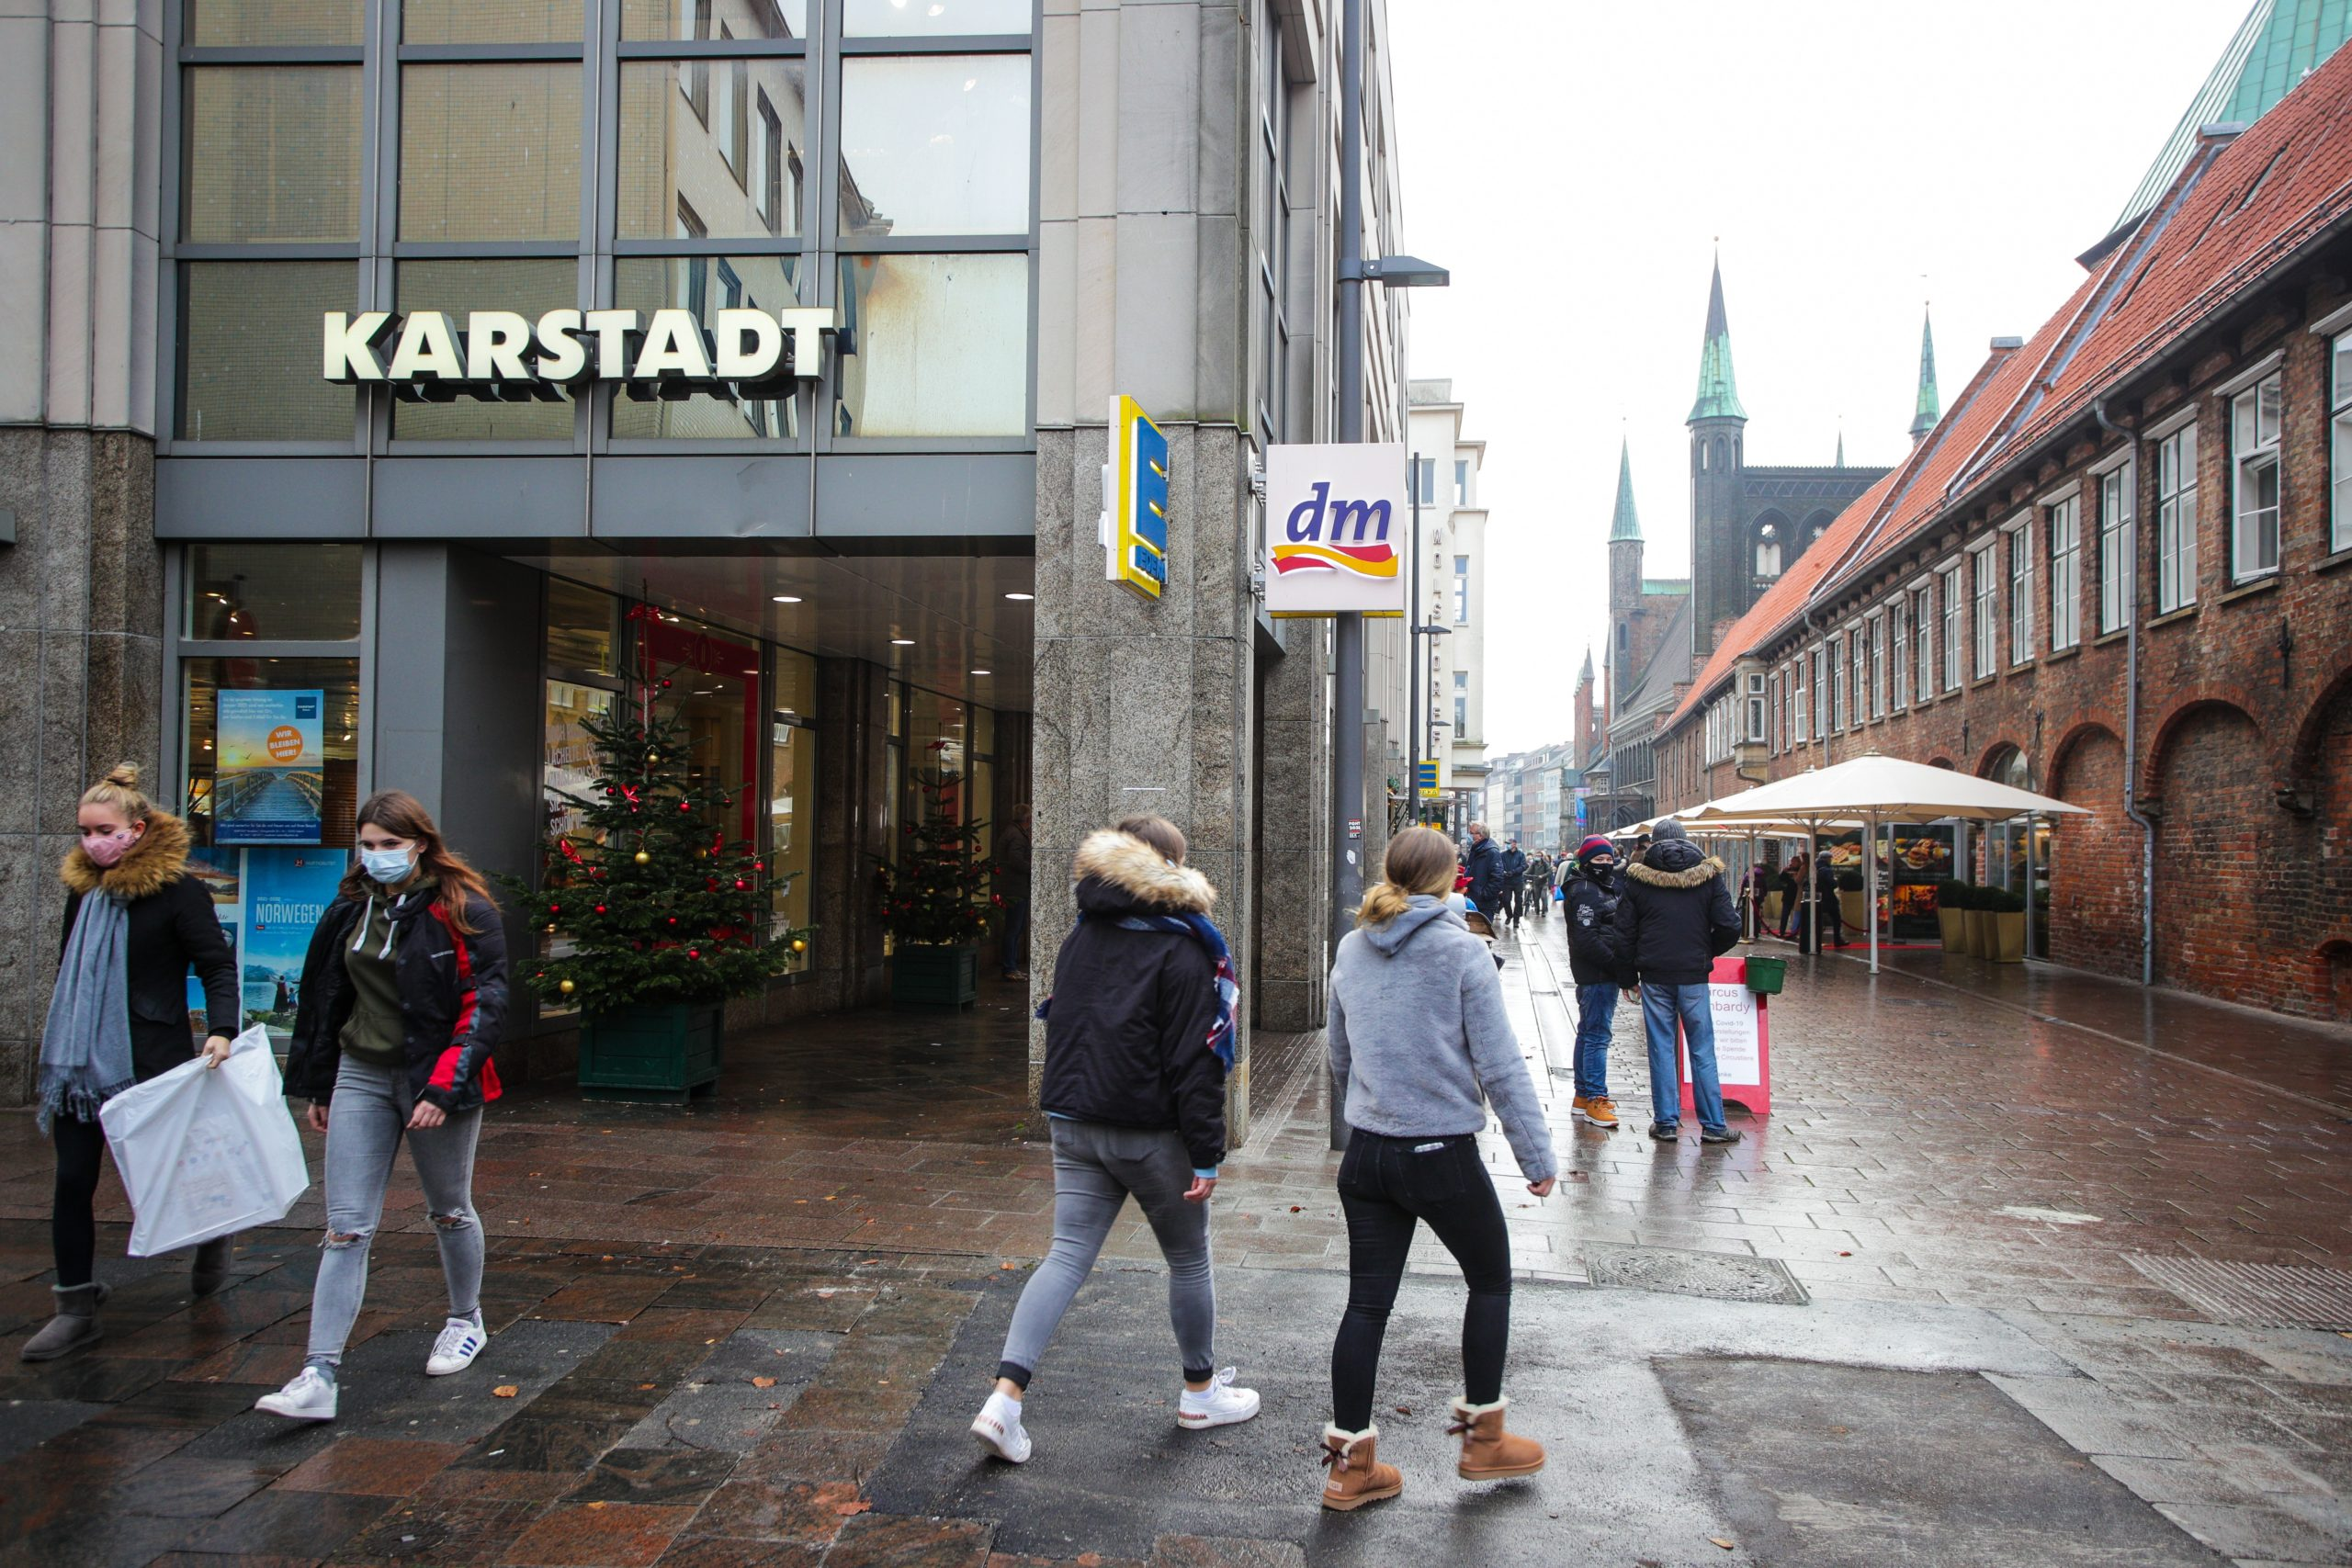 Karstadt Lübeck Rettung Innenstadt